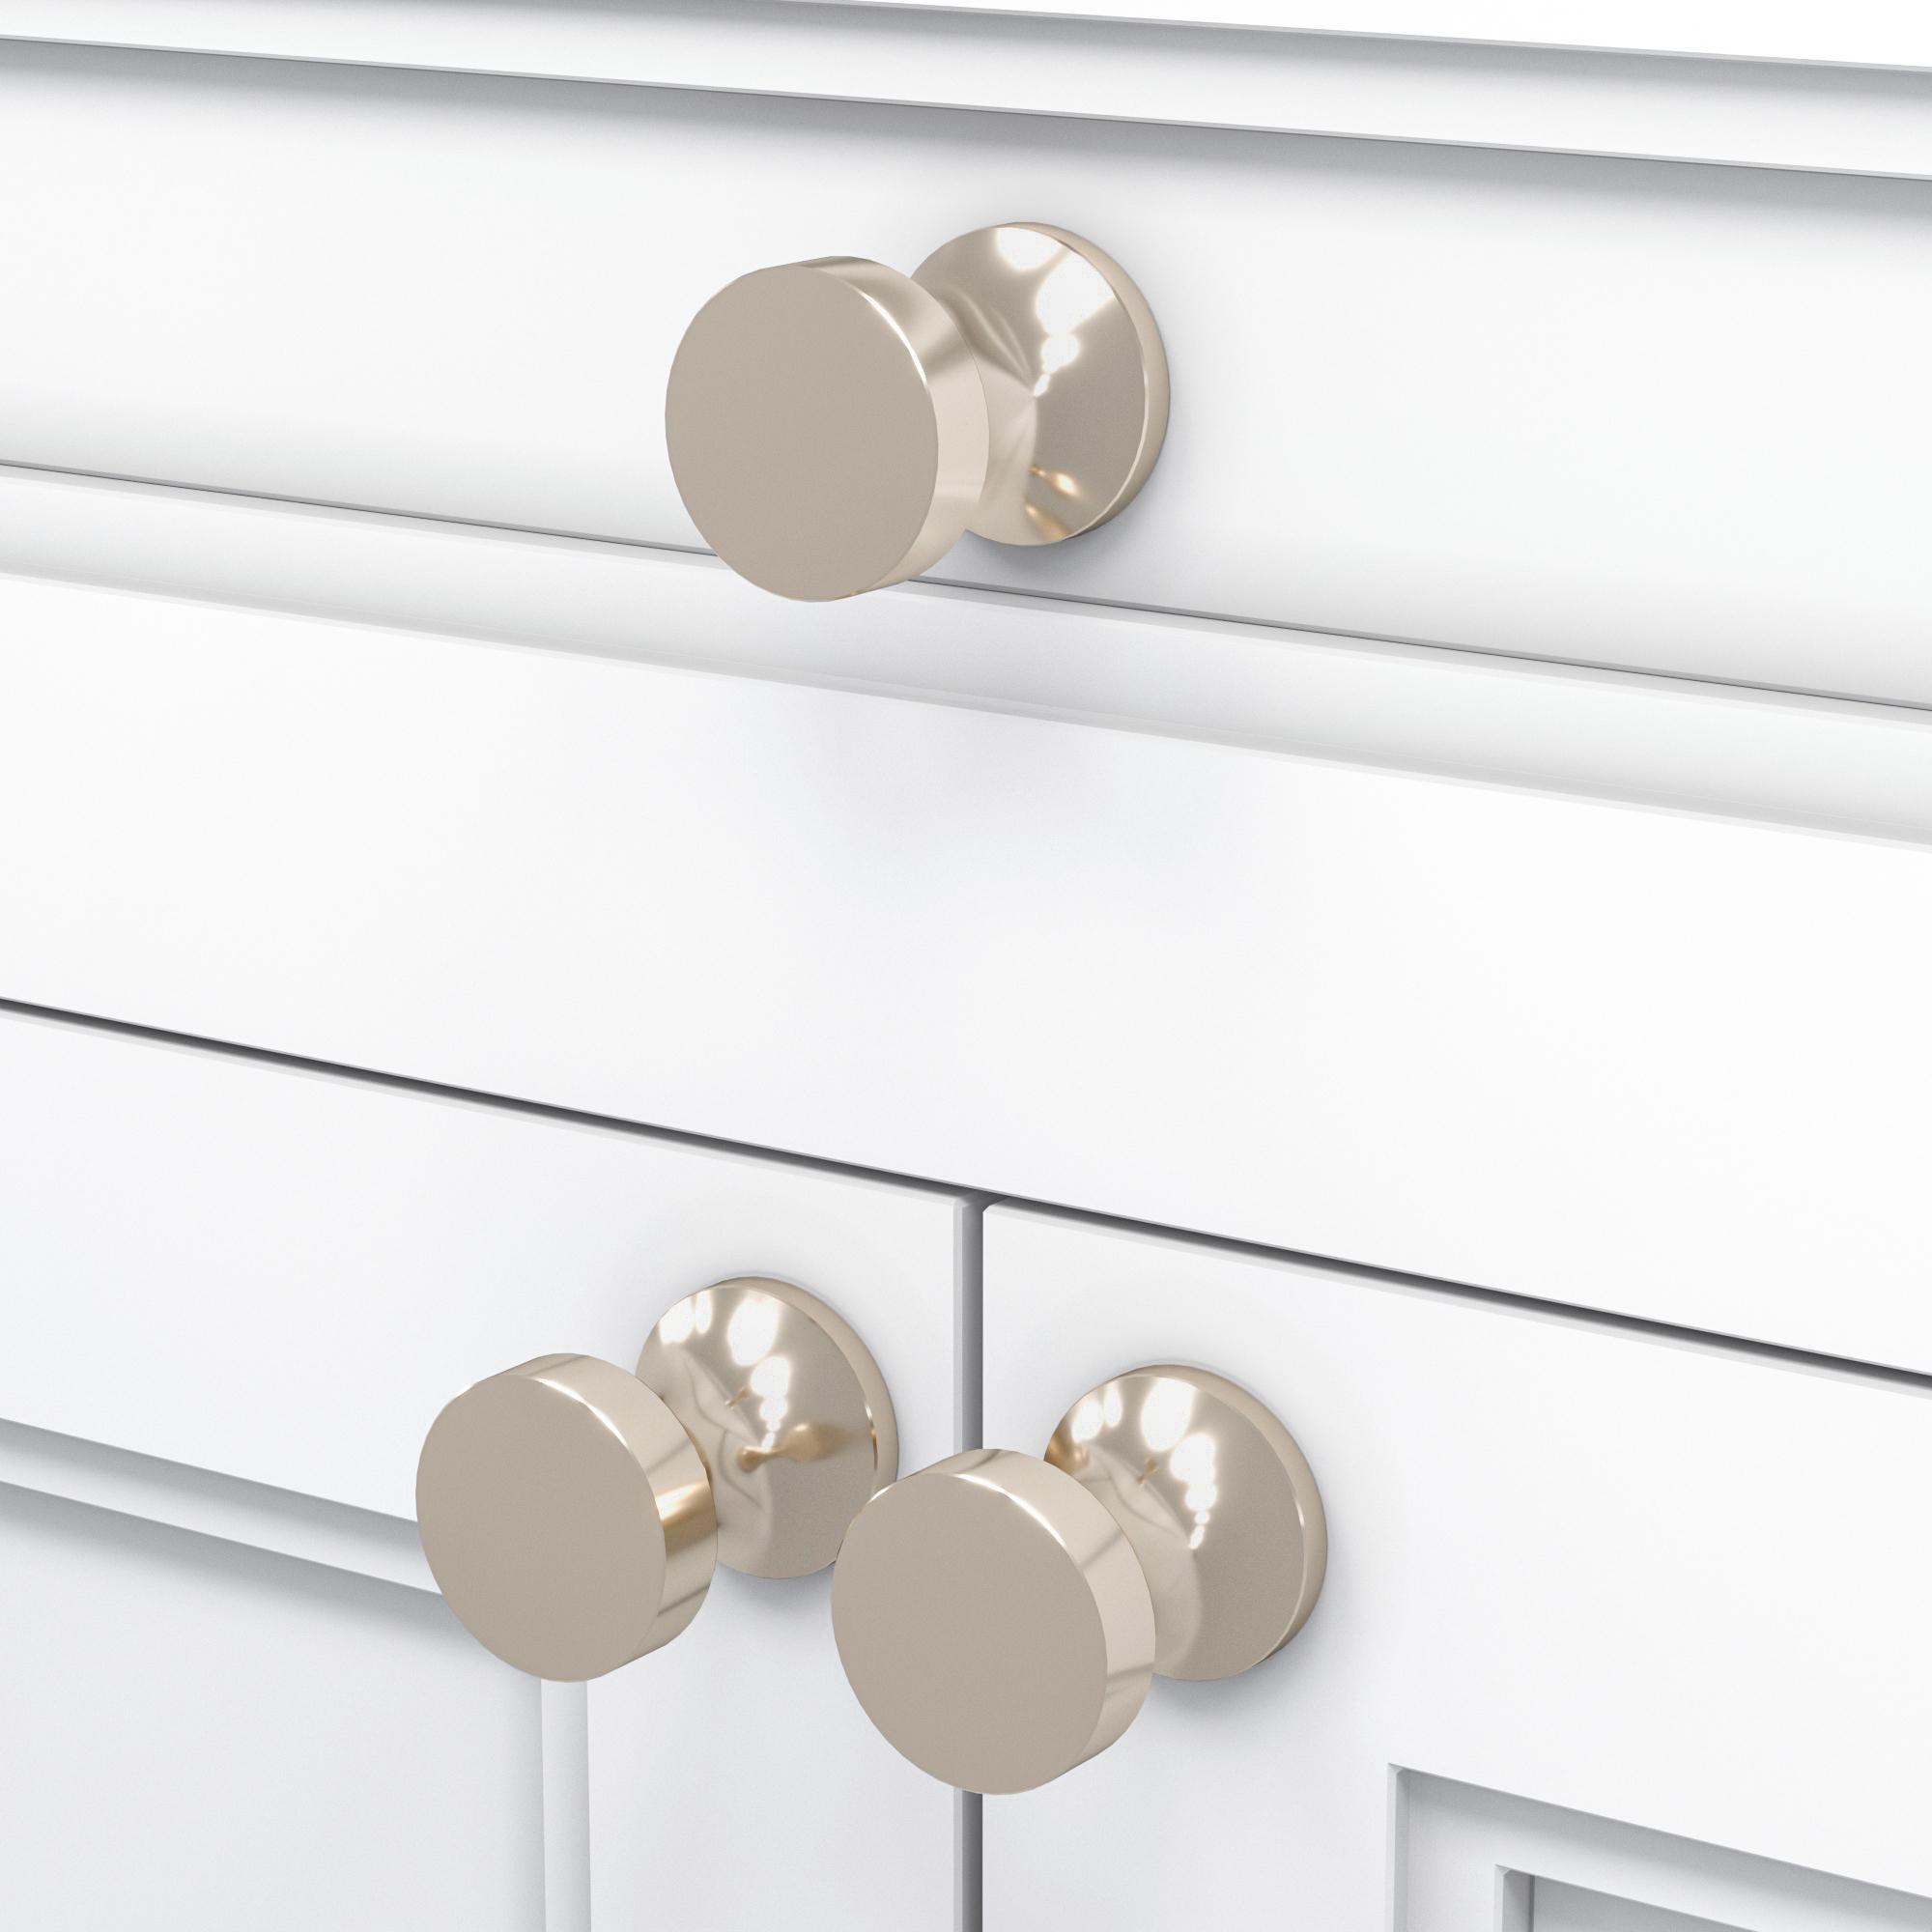 Кнопка Larch/Polished Nickel